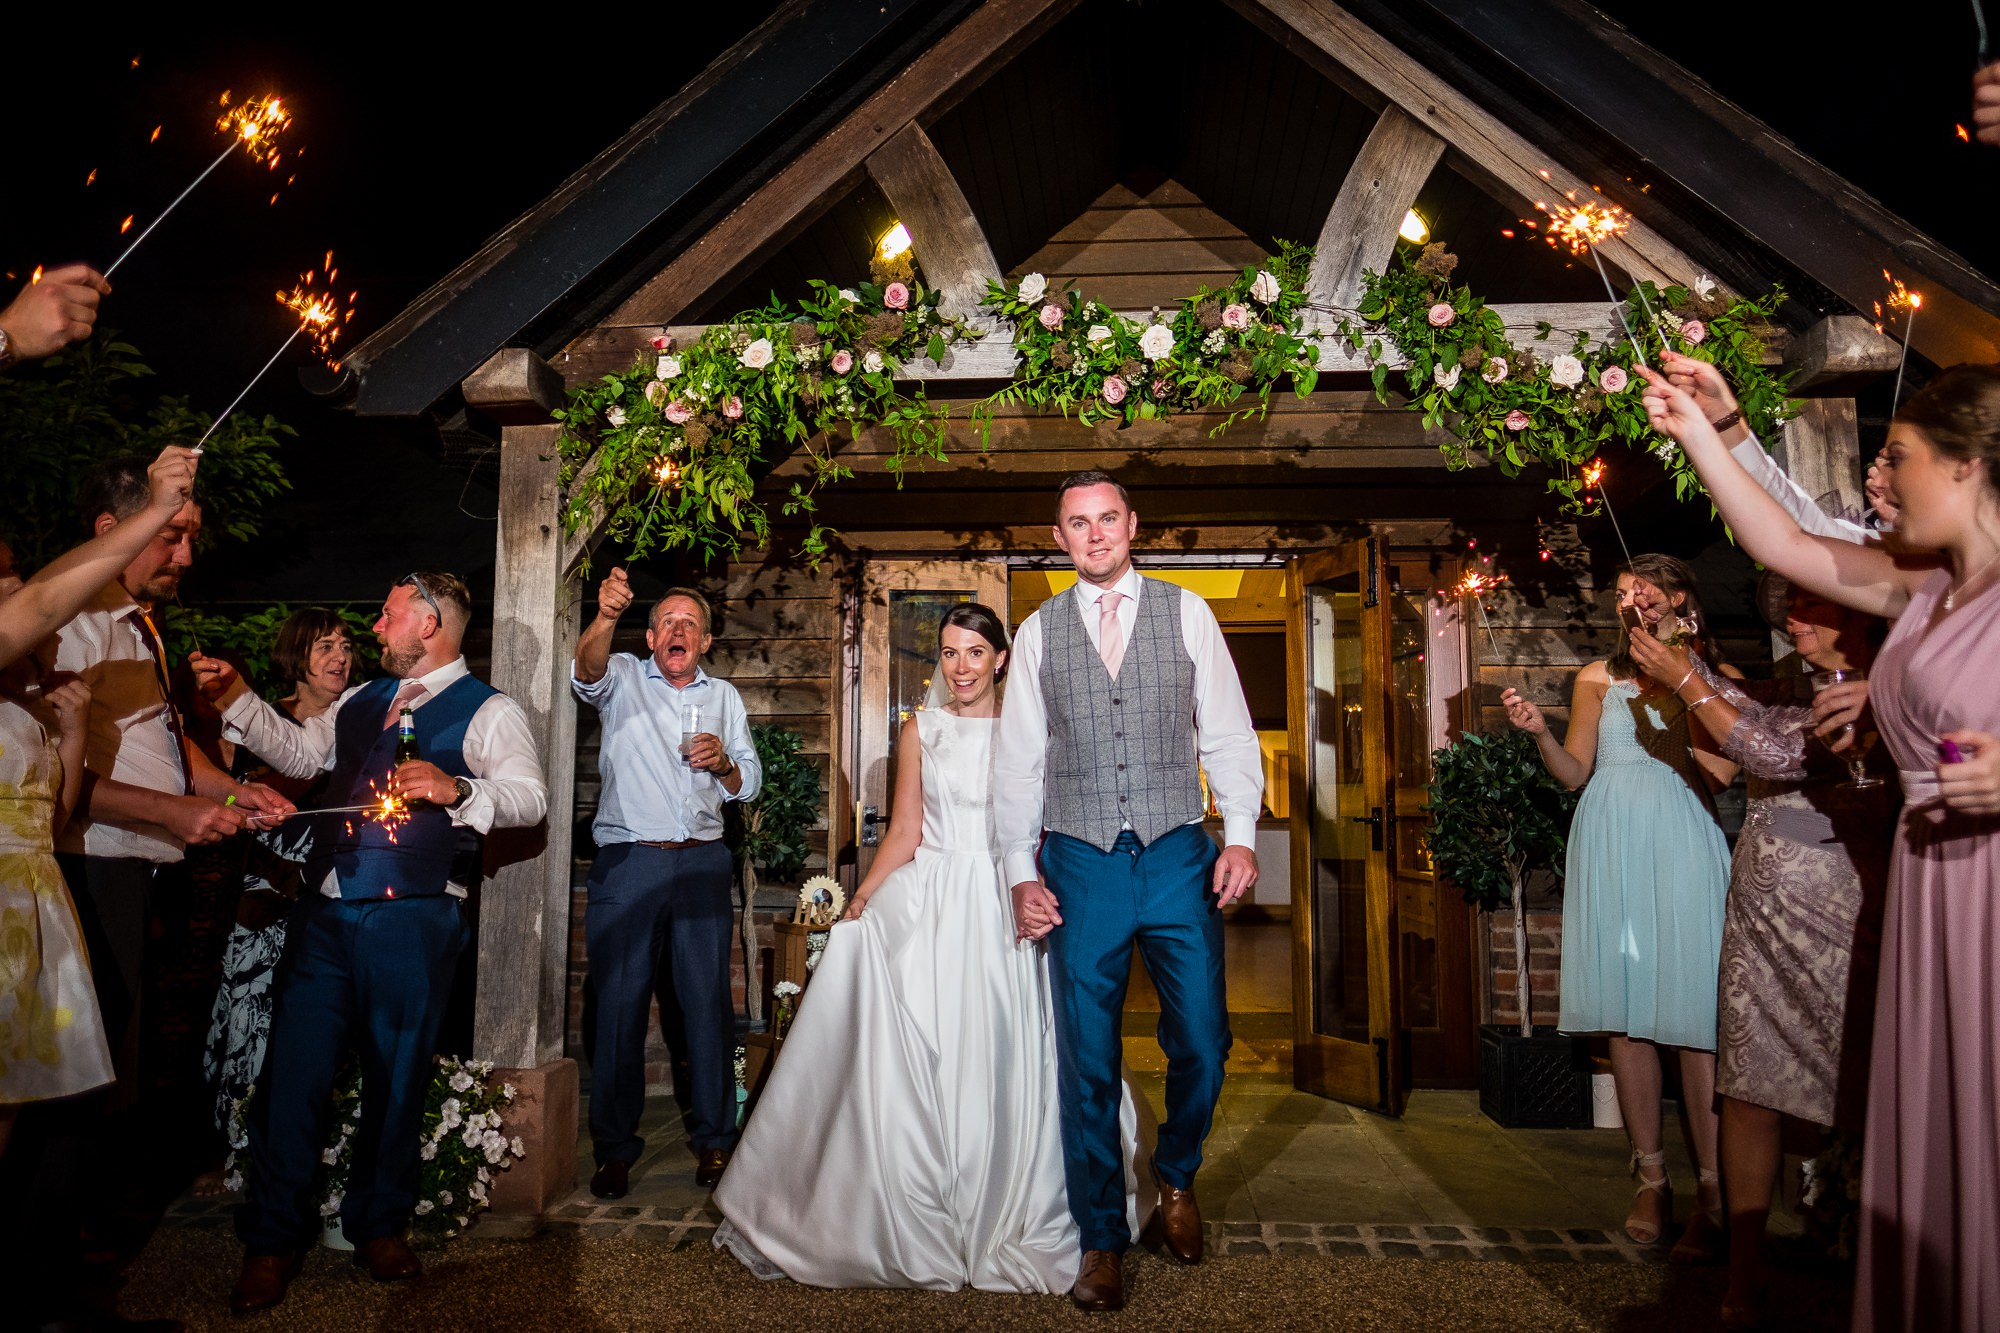 bride and groom walking through sparklers